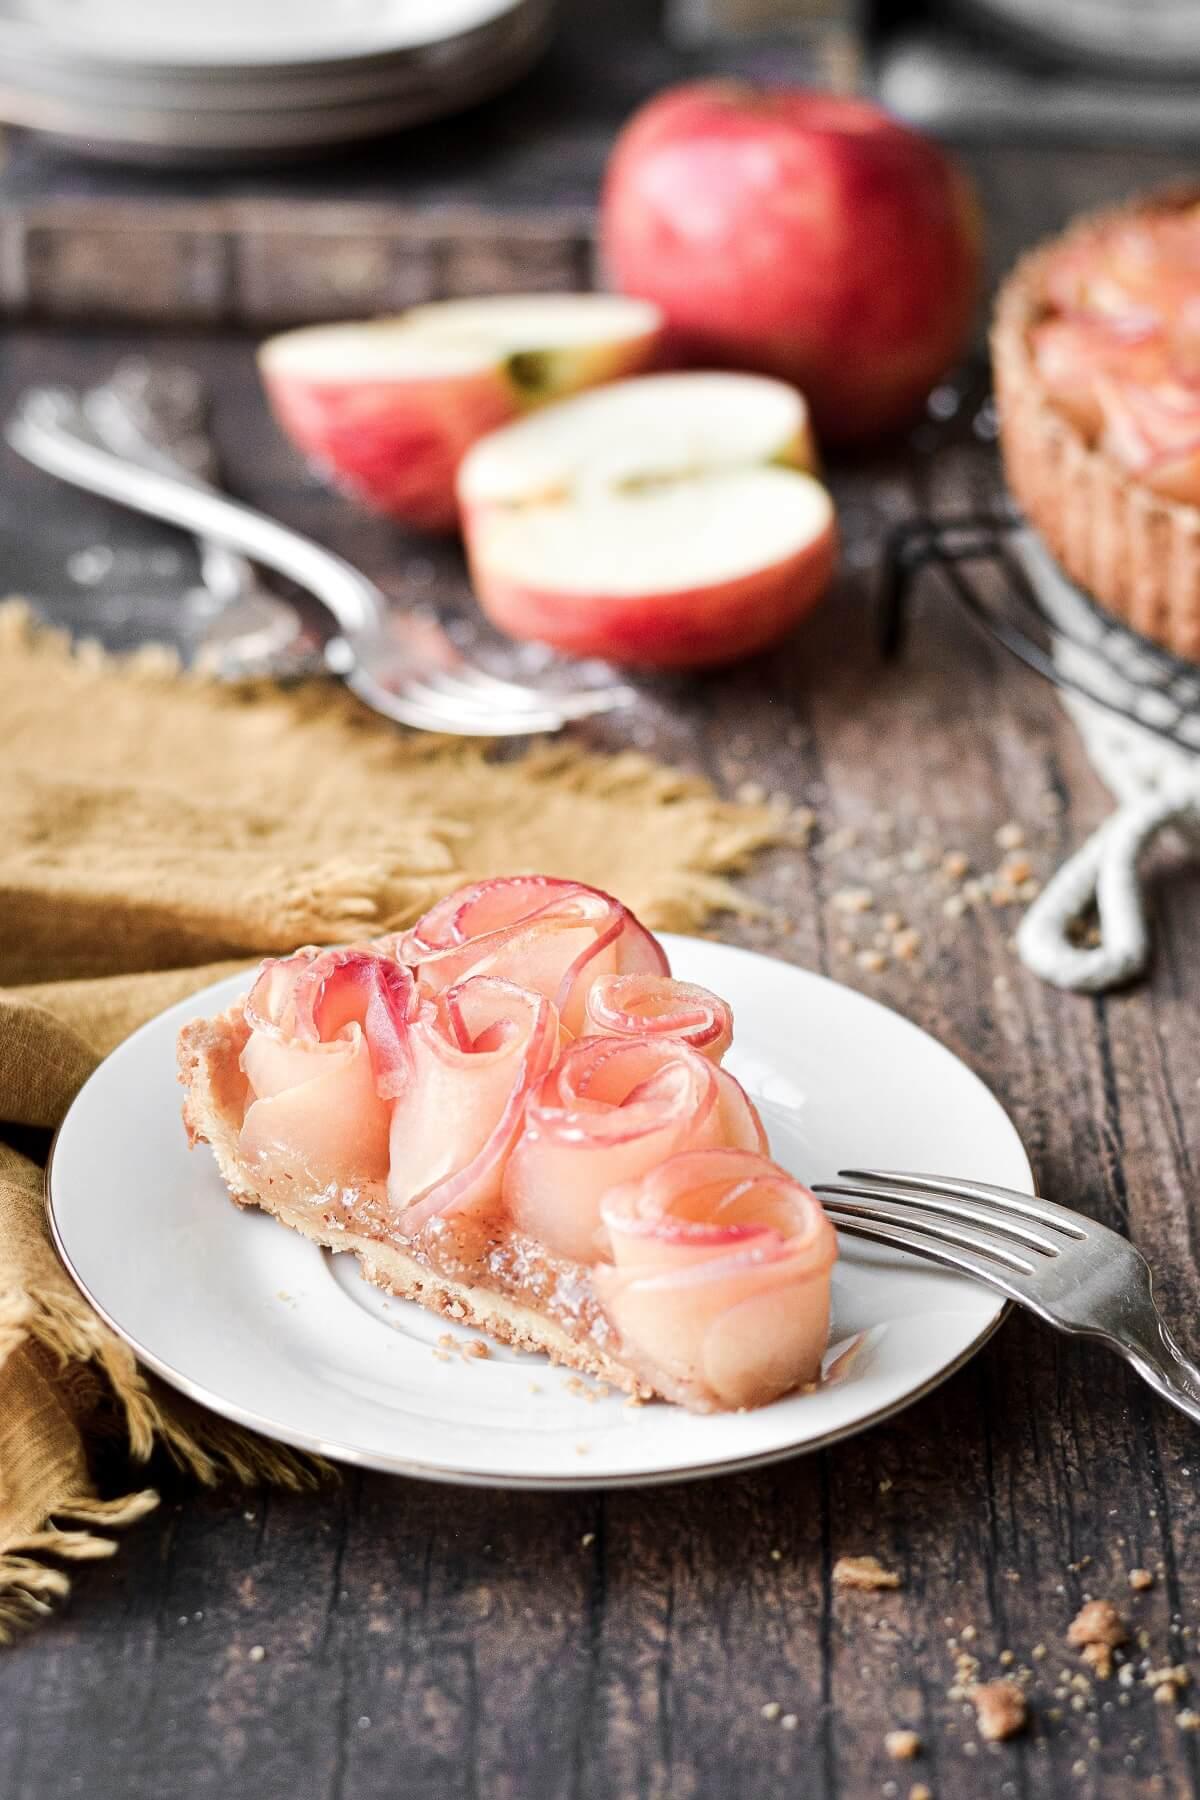 A slice of apple rose tart.